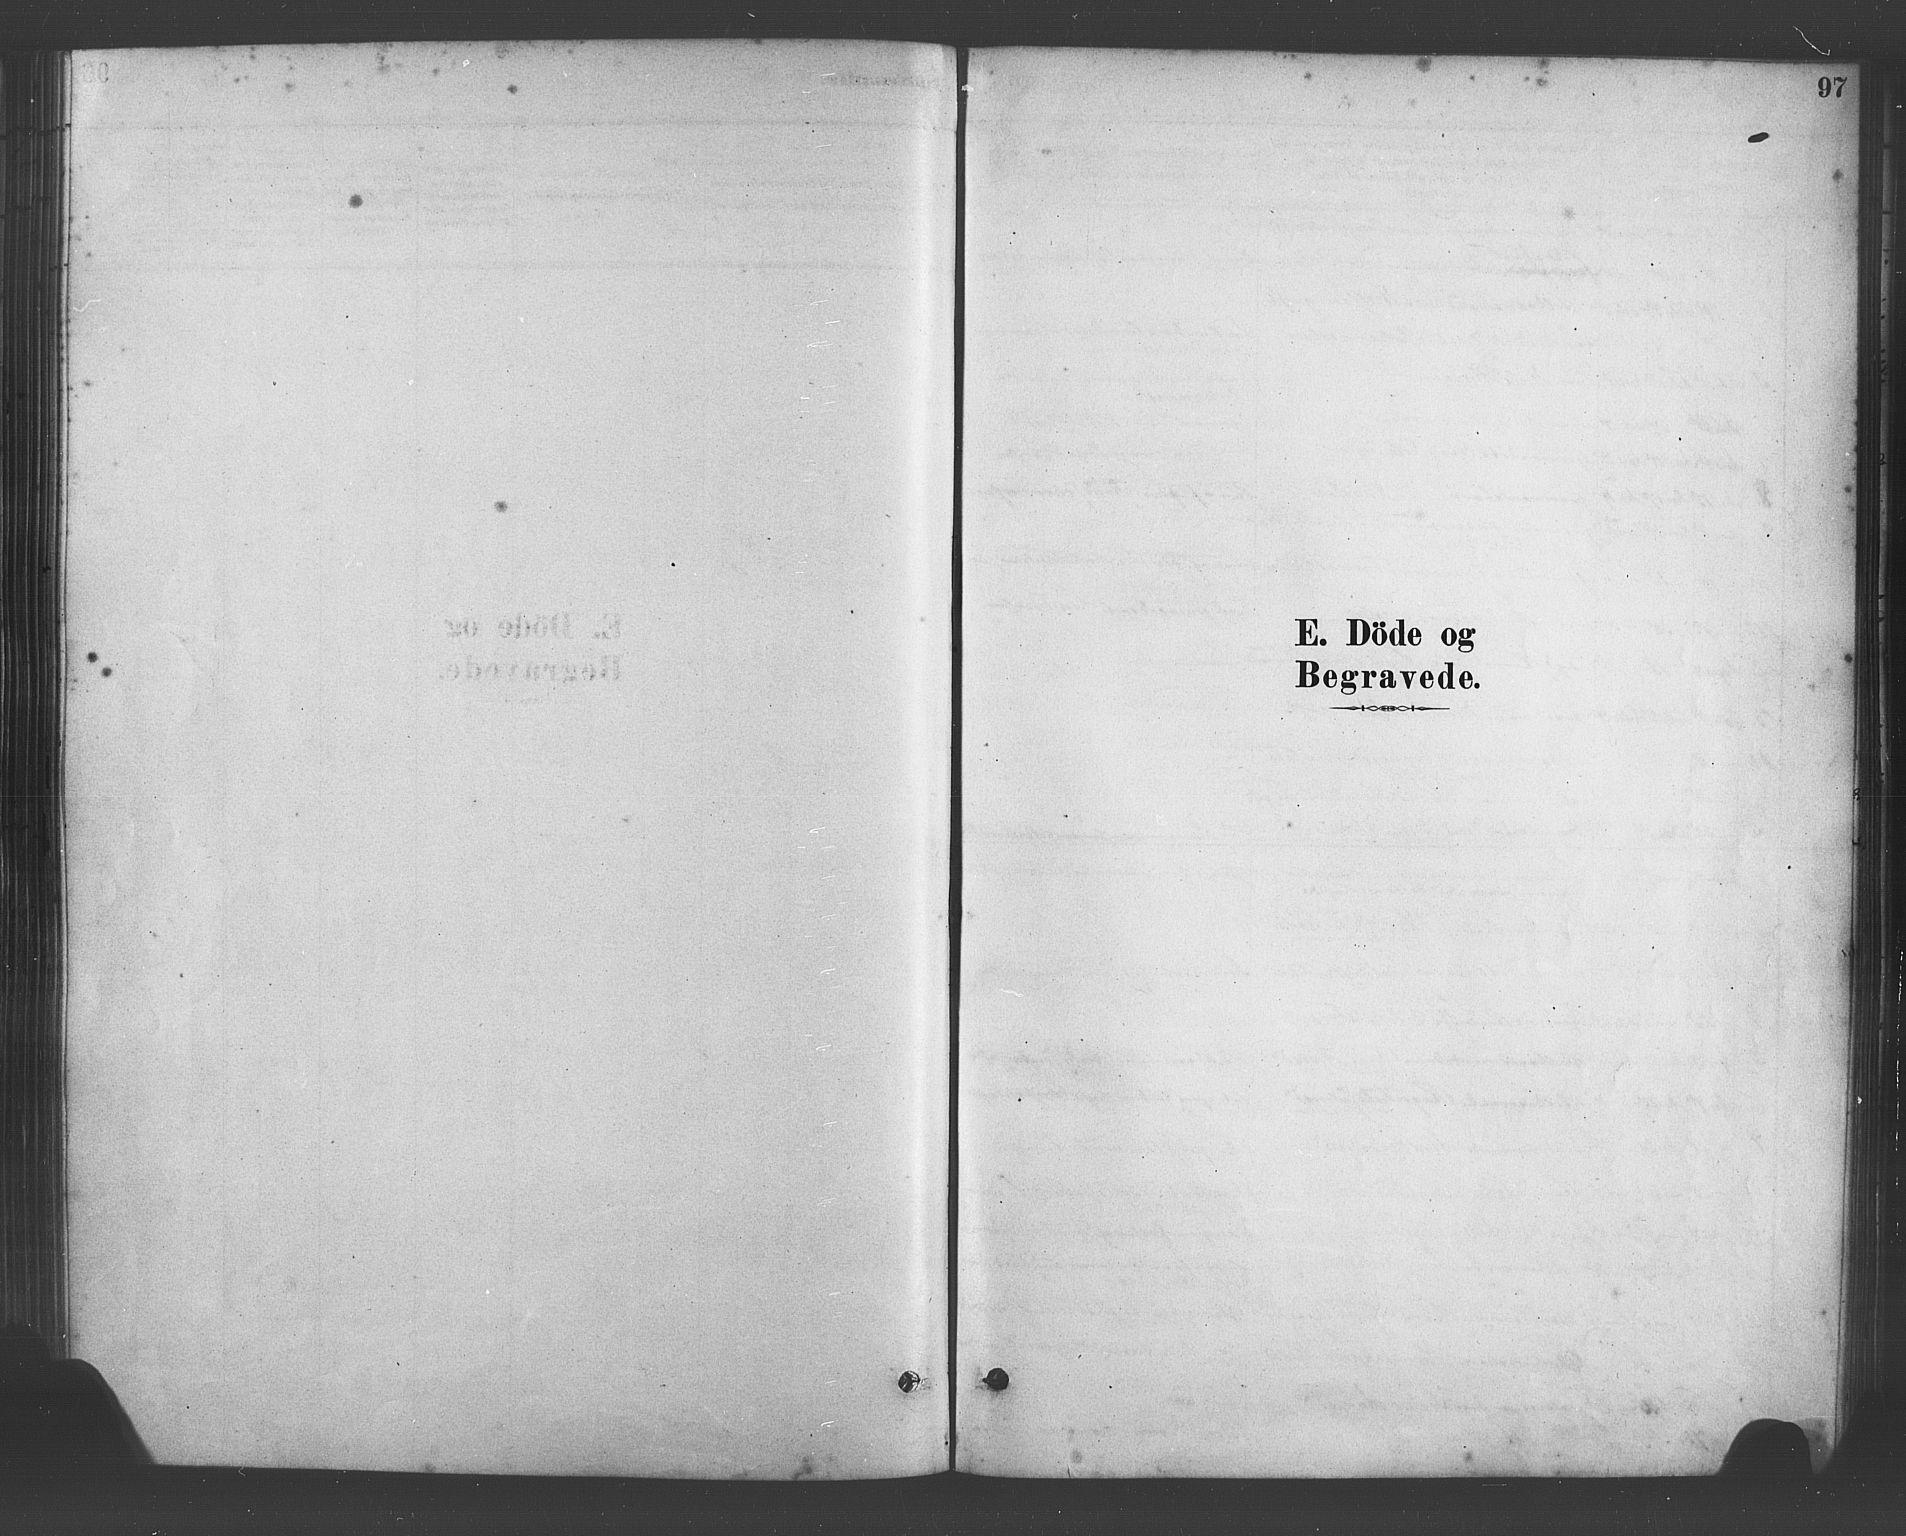 SAB, Fana Sokneprestembete, H/Haa/Haab/L0001: Ministerialbok nr. B 1, 1878-1889, s. 97